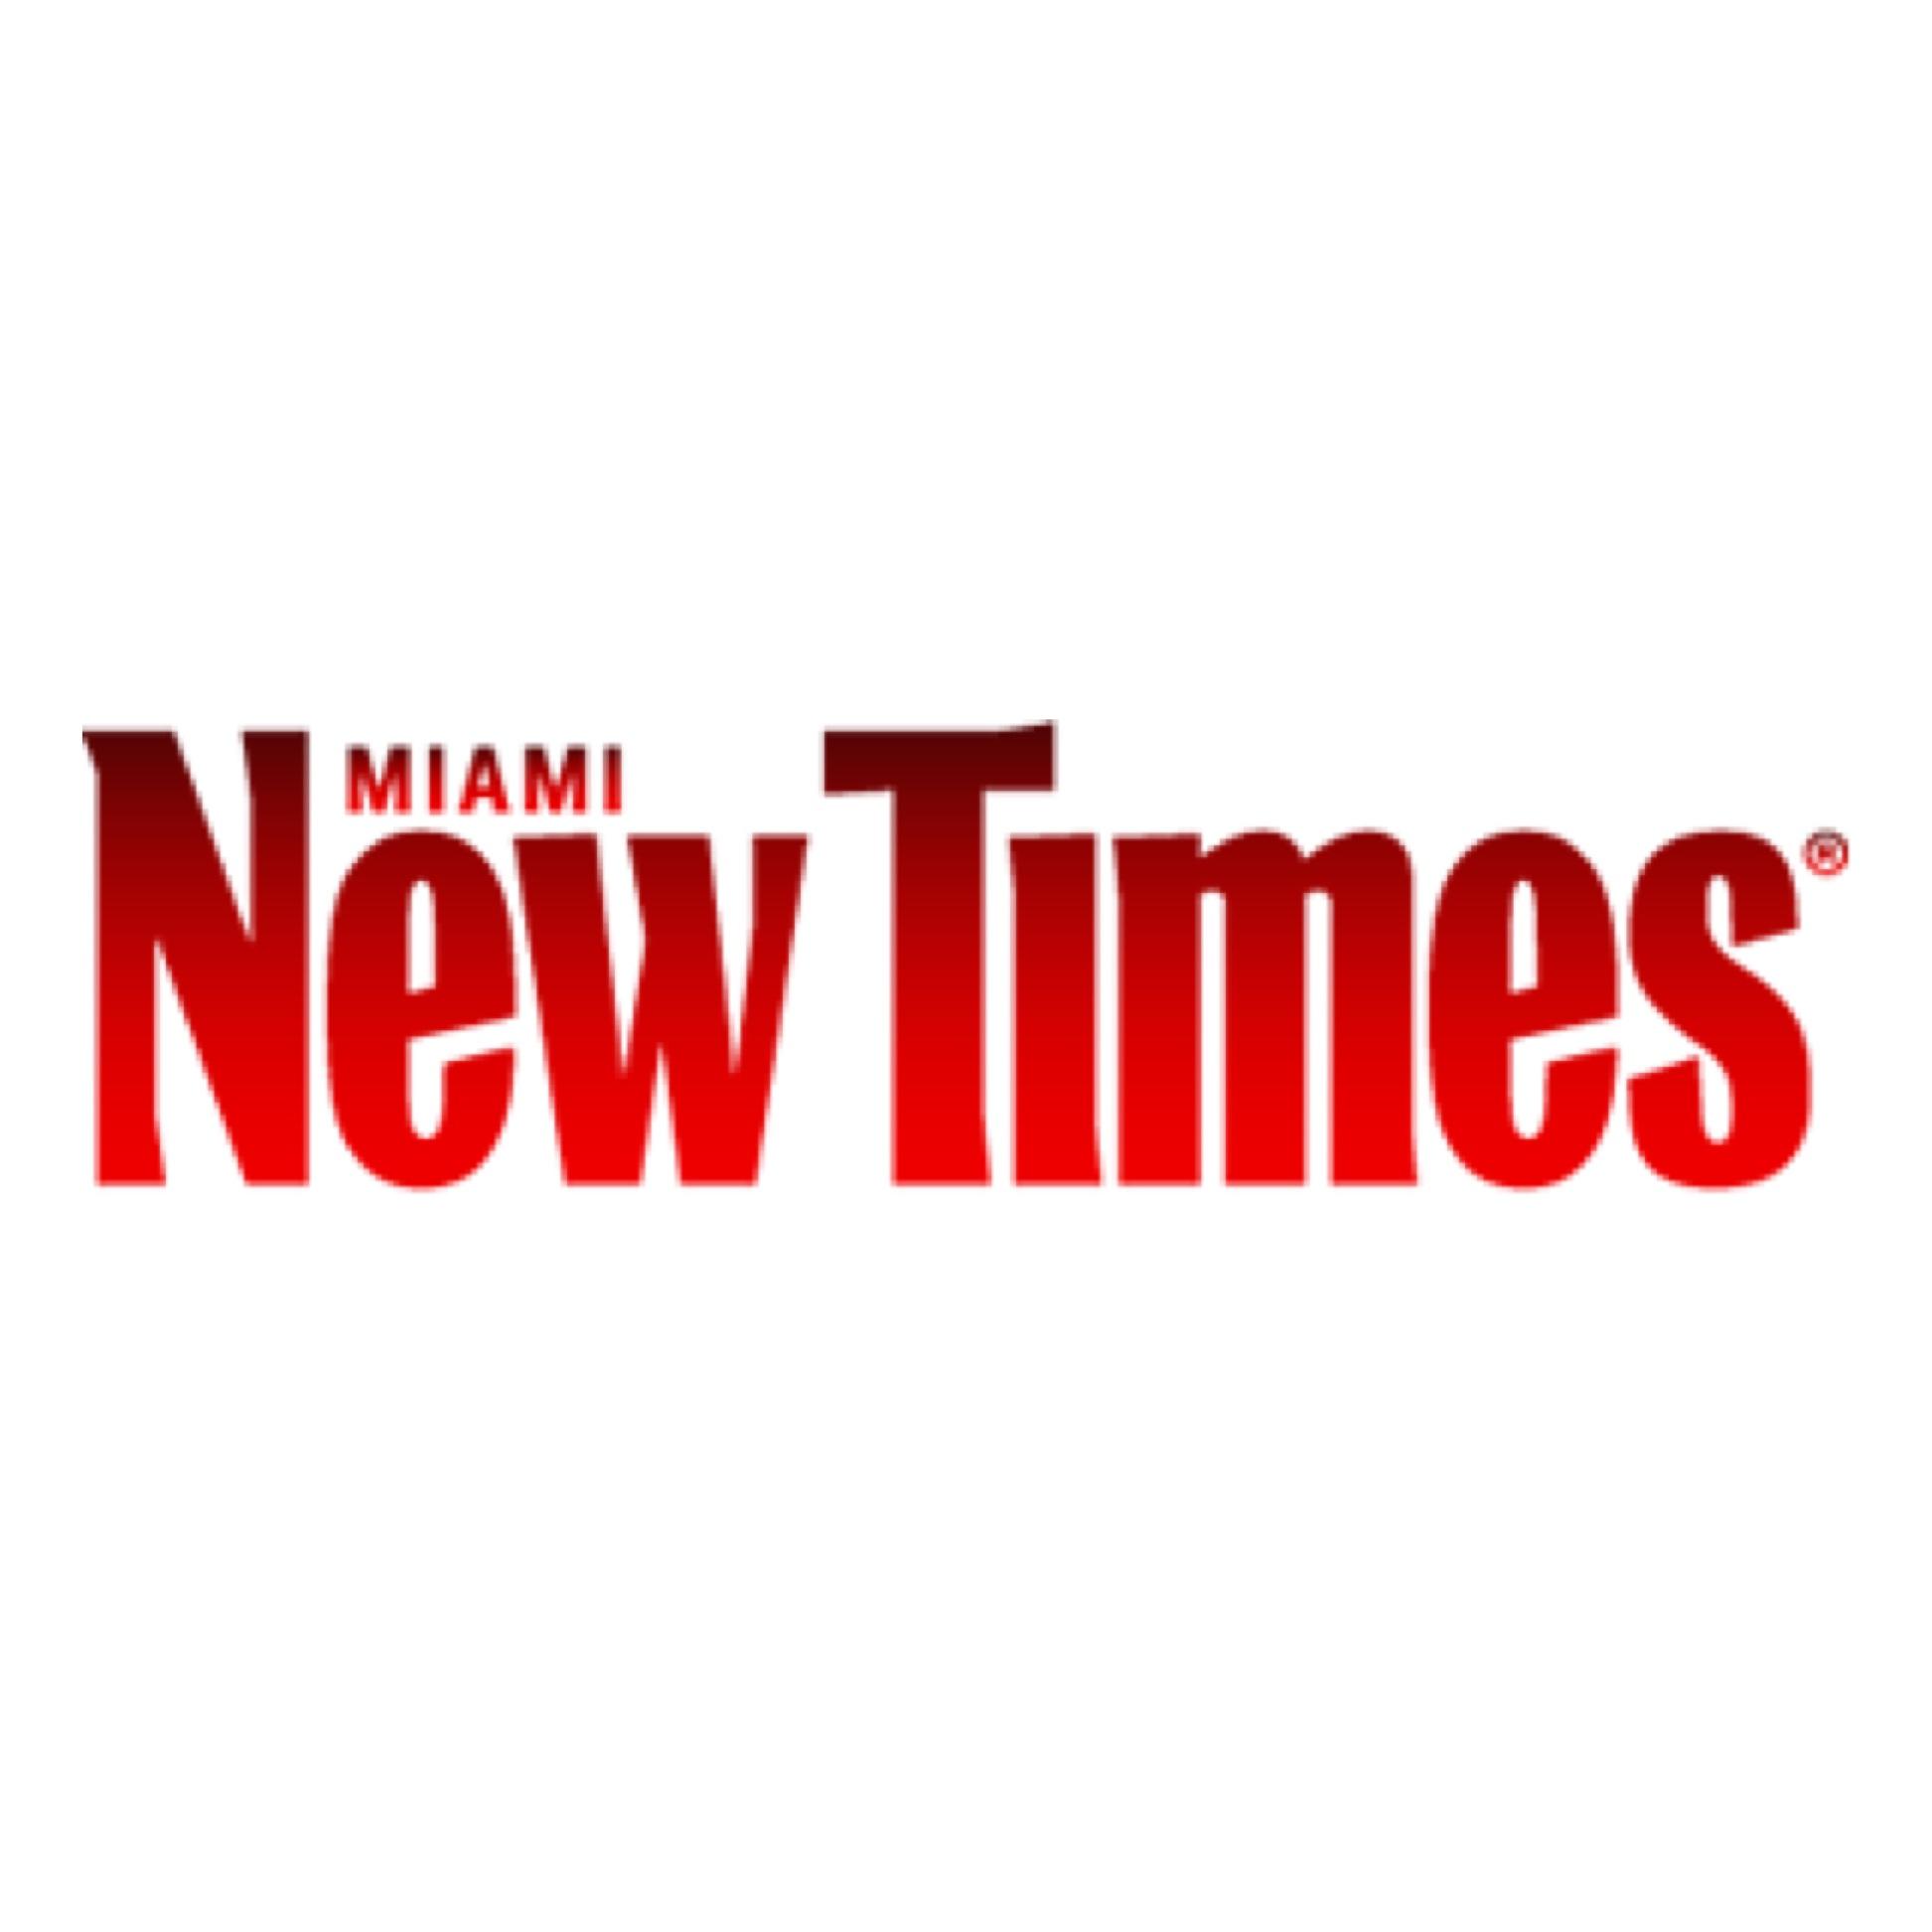 miami new times logo.jpg